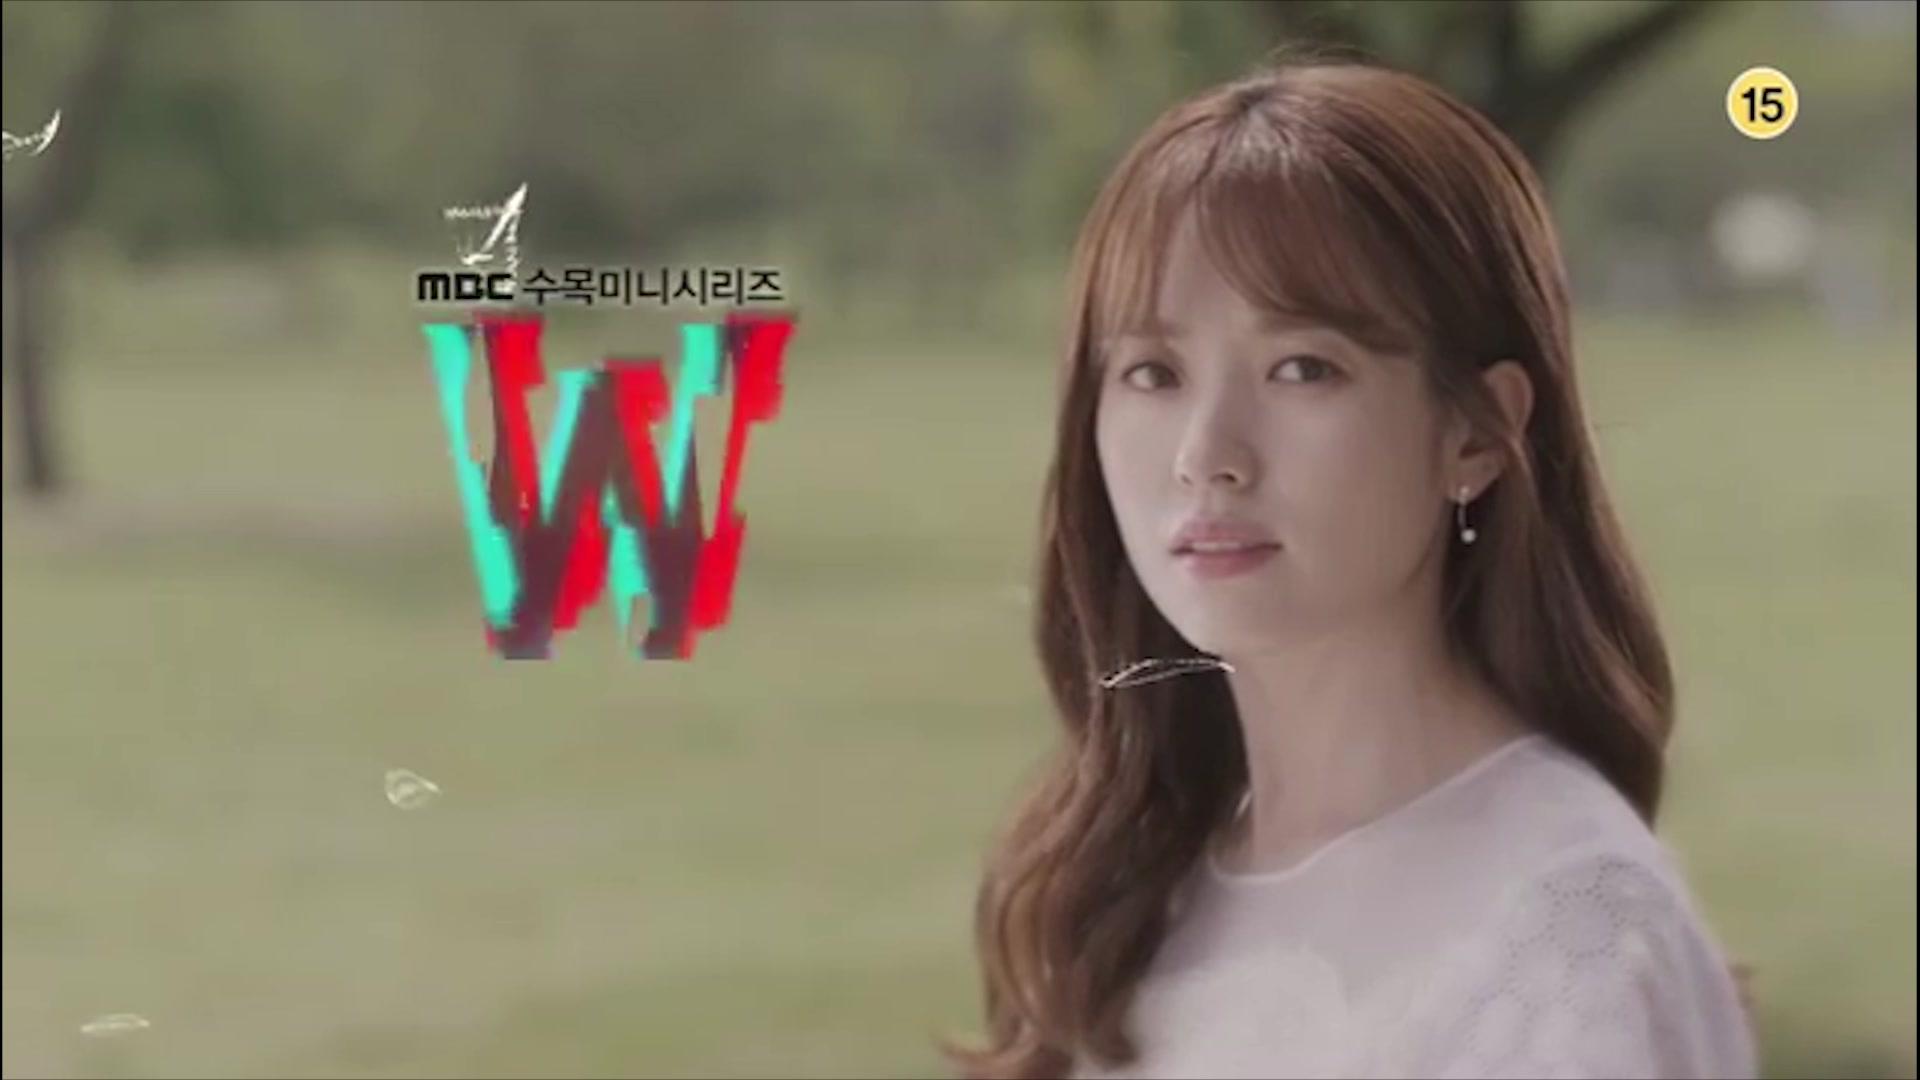 Teaser 1: W